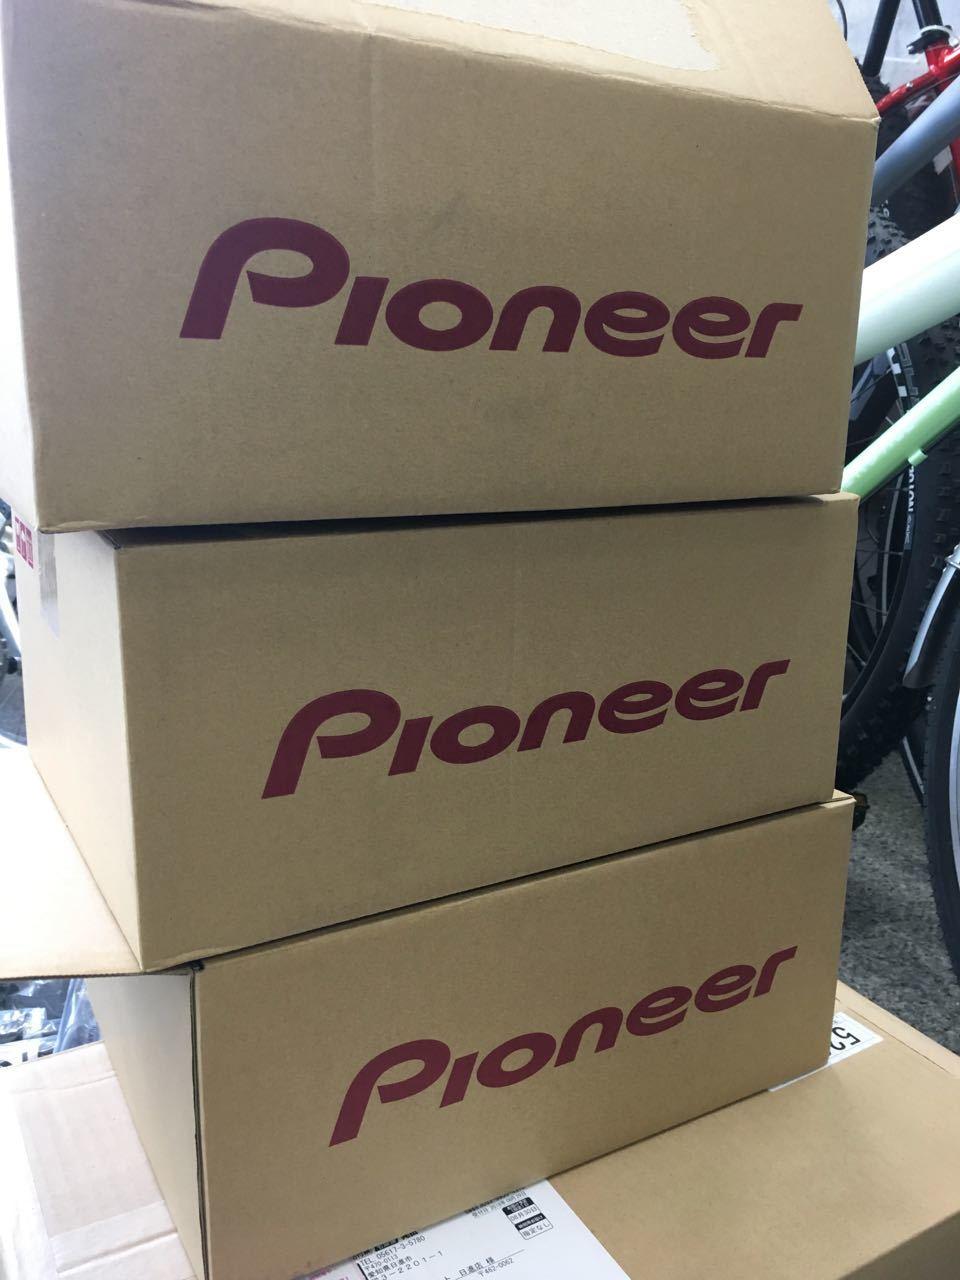 2018.08.30「PIONEERパワーメーター」_c0197974_21205043.jpg